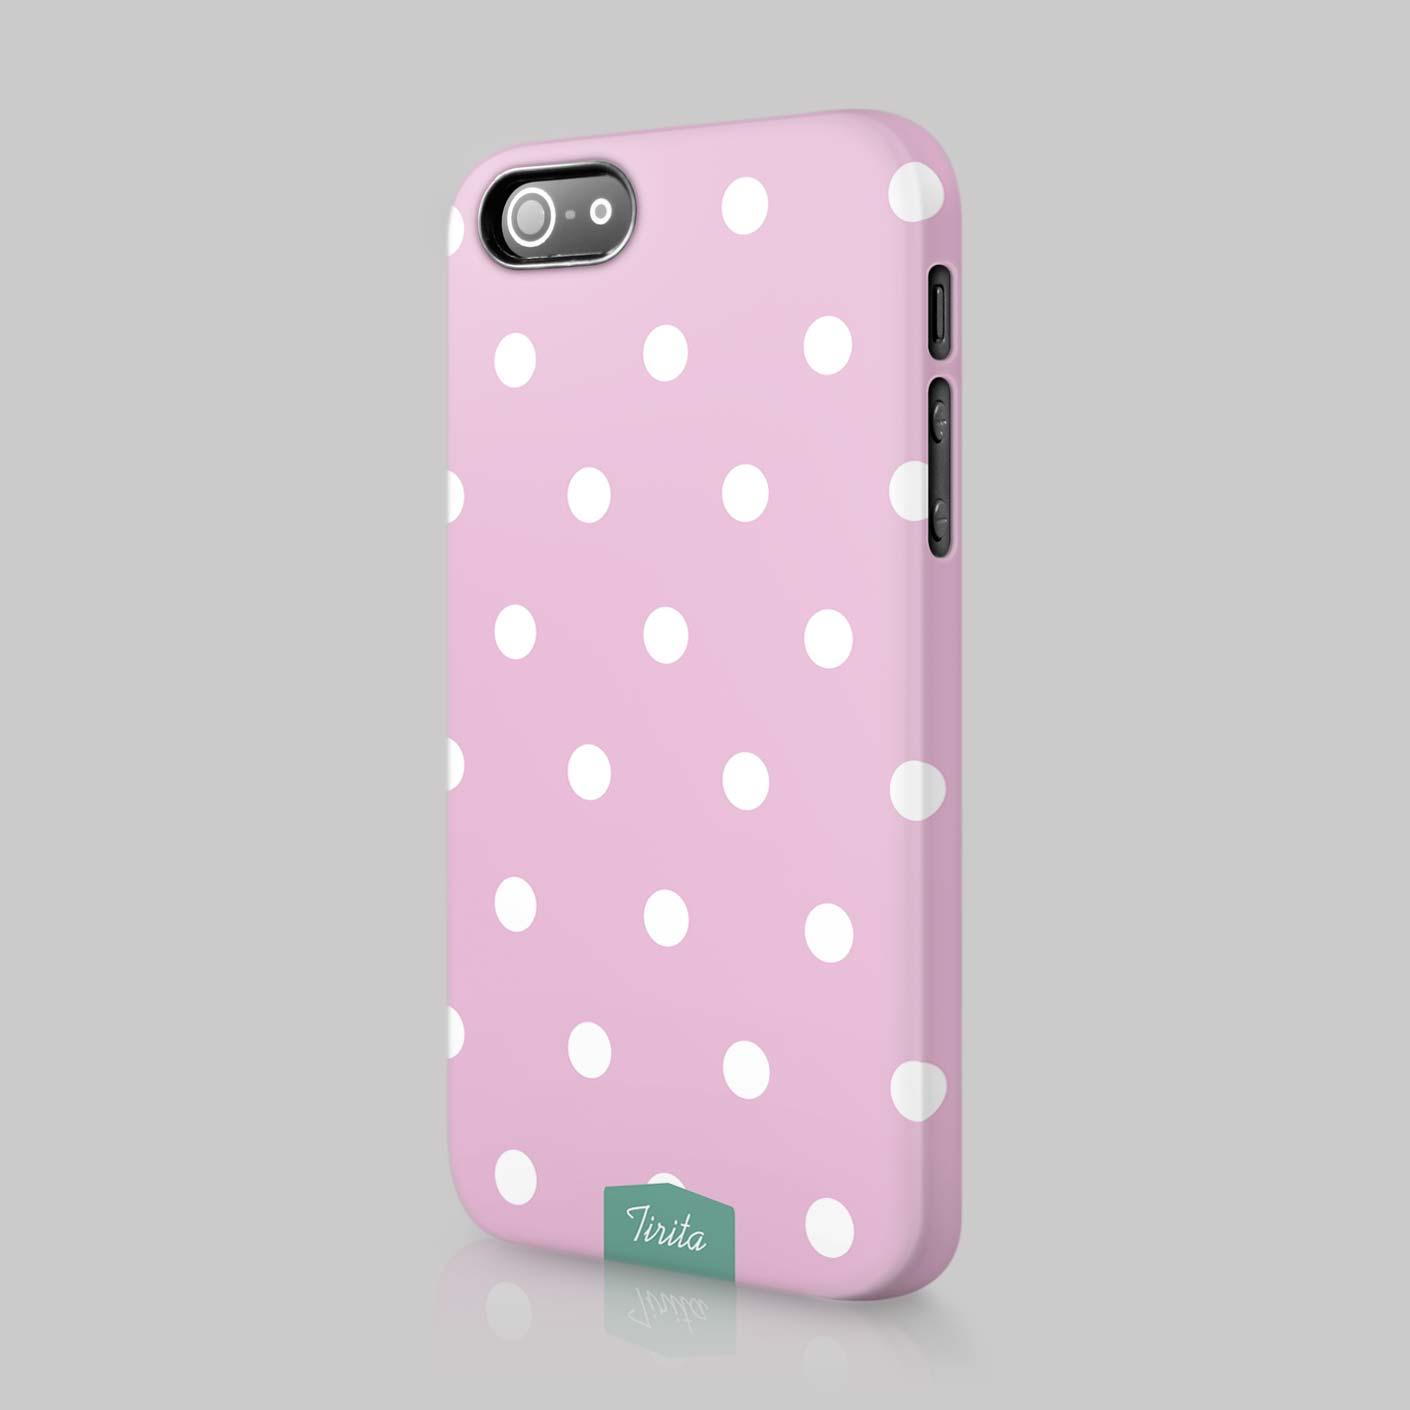 Tirita Polka Dots Fashion Case Hard Cover For Iphone